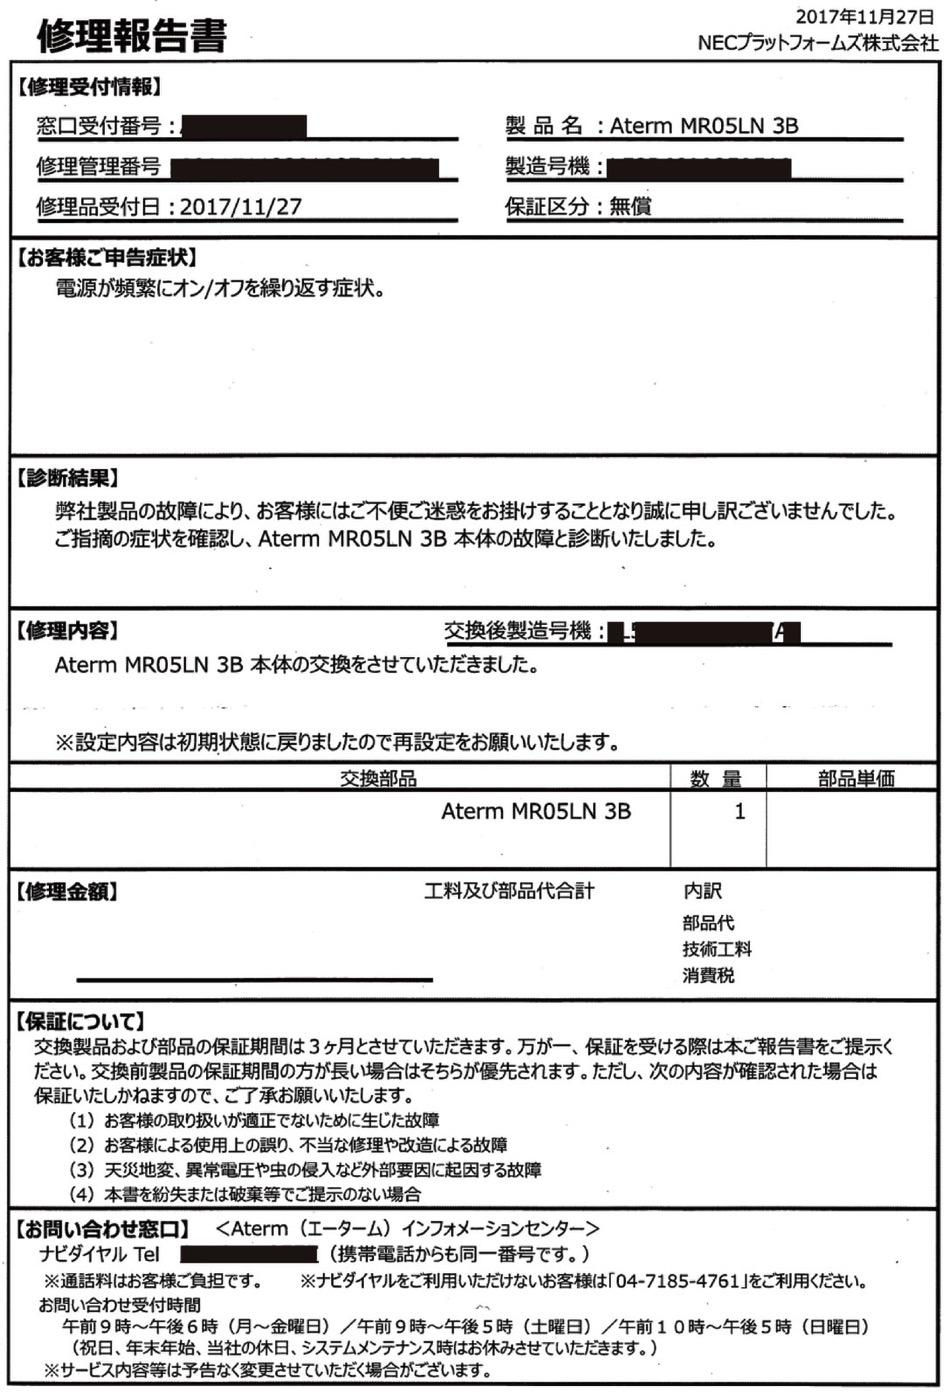 NEC Aterm MR05LN 3B-修理報告書